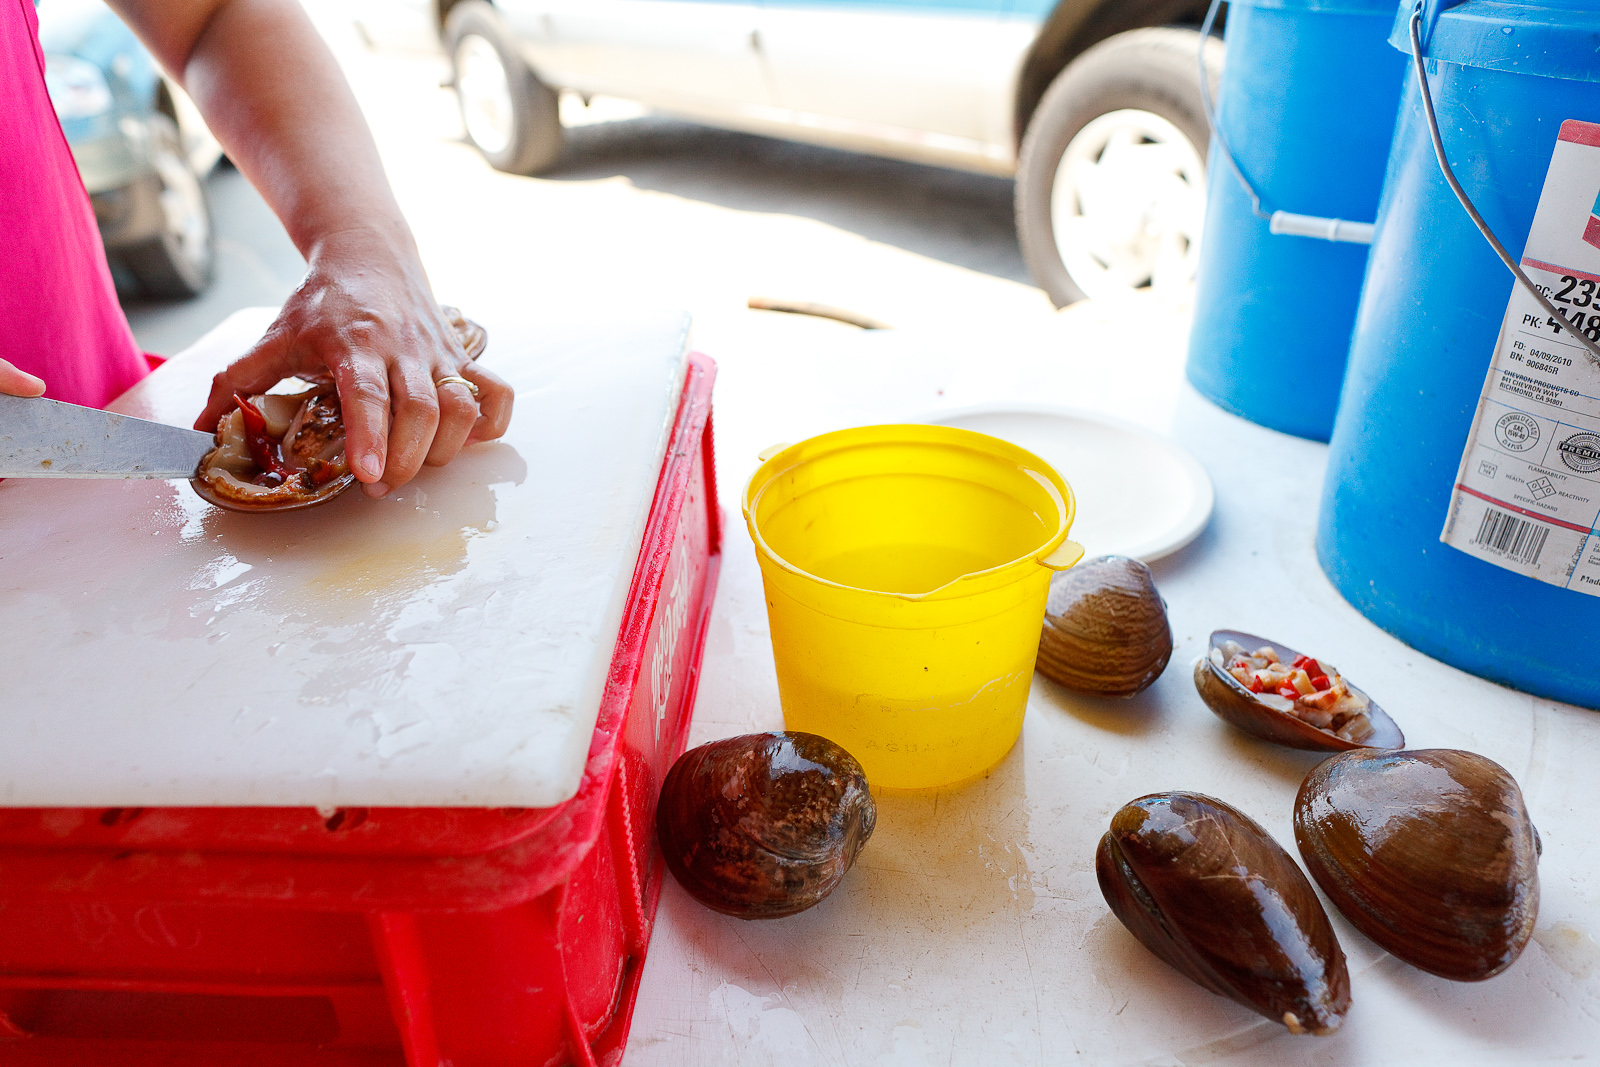 Shucking almejas chocolatas (chocolate clams)